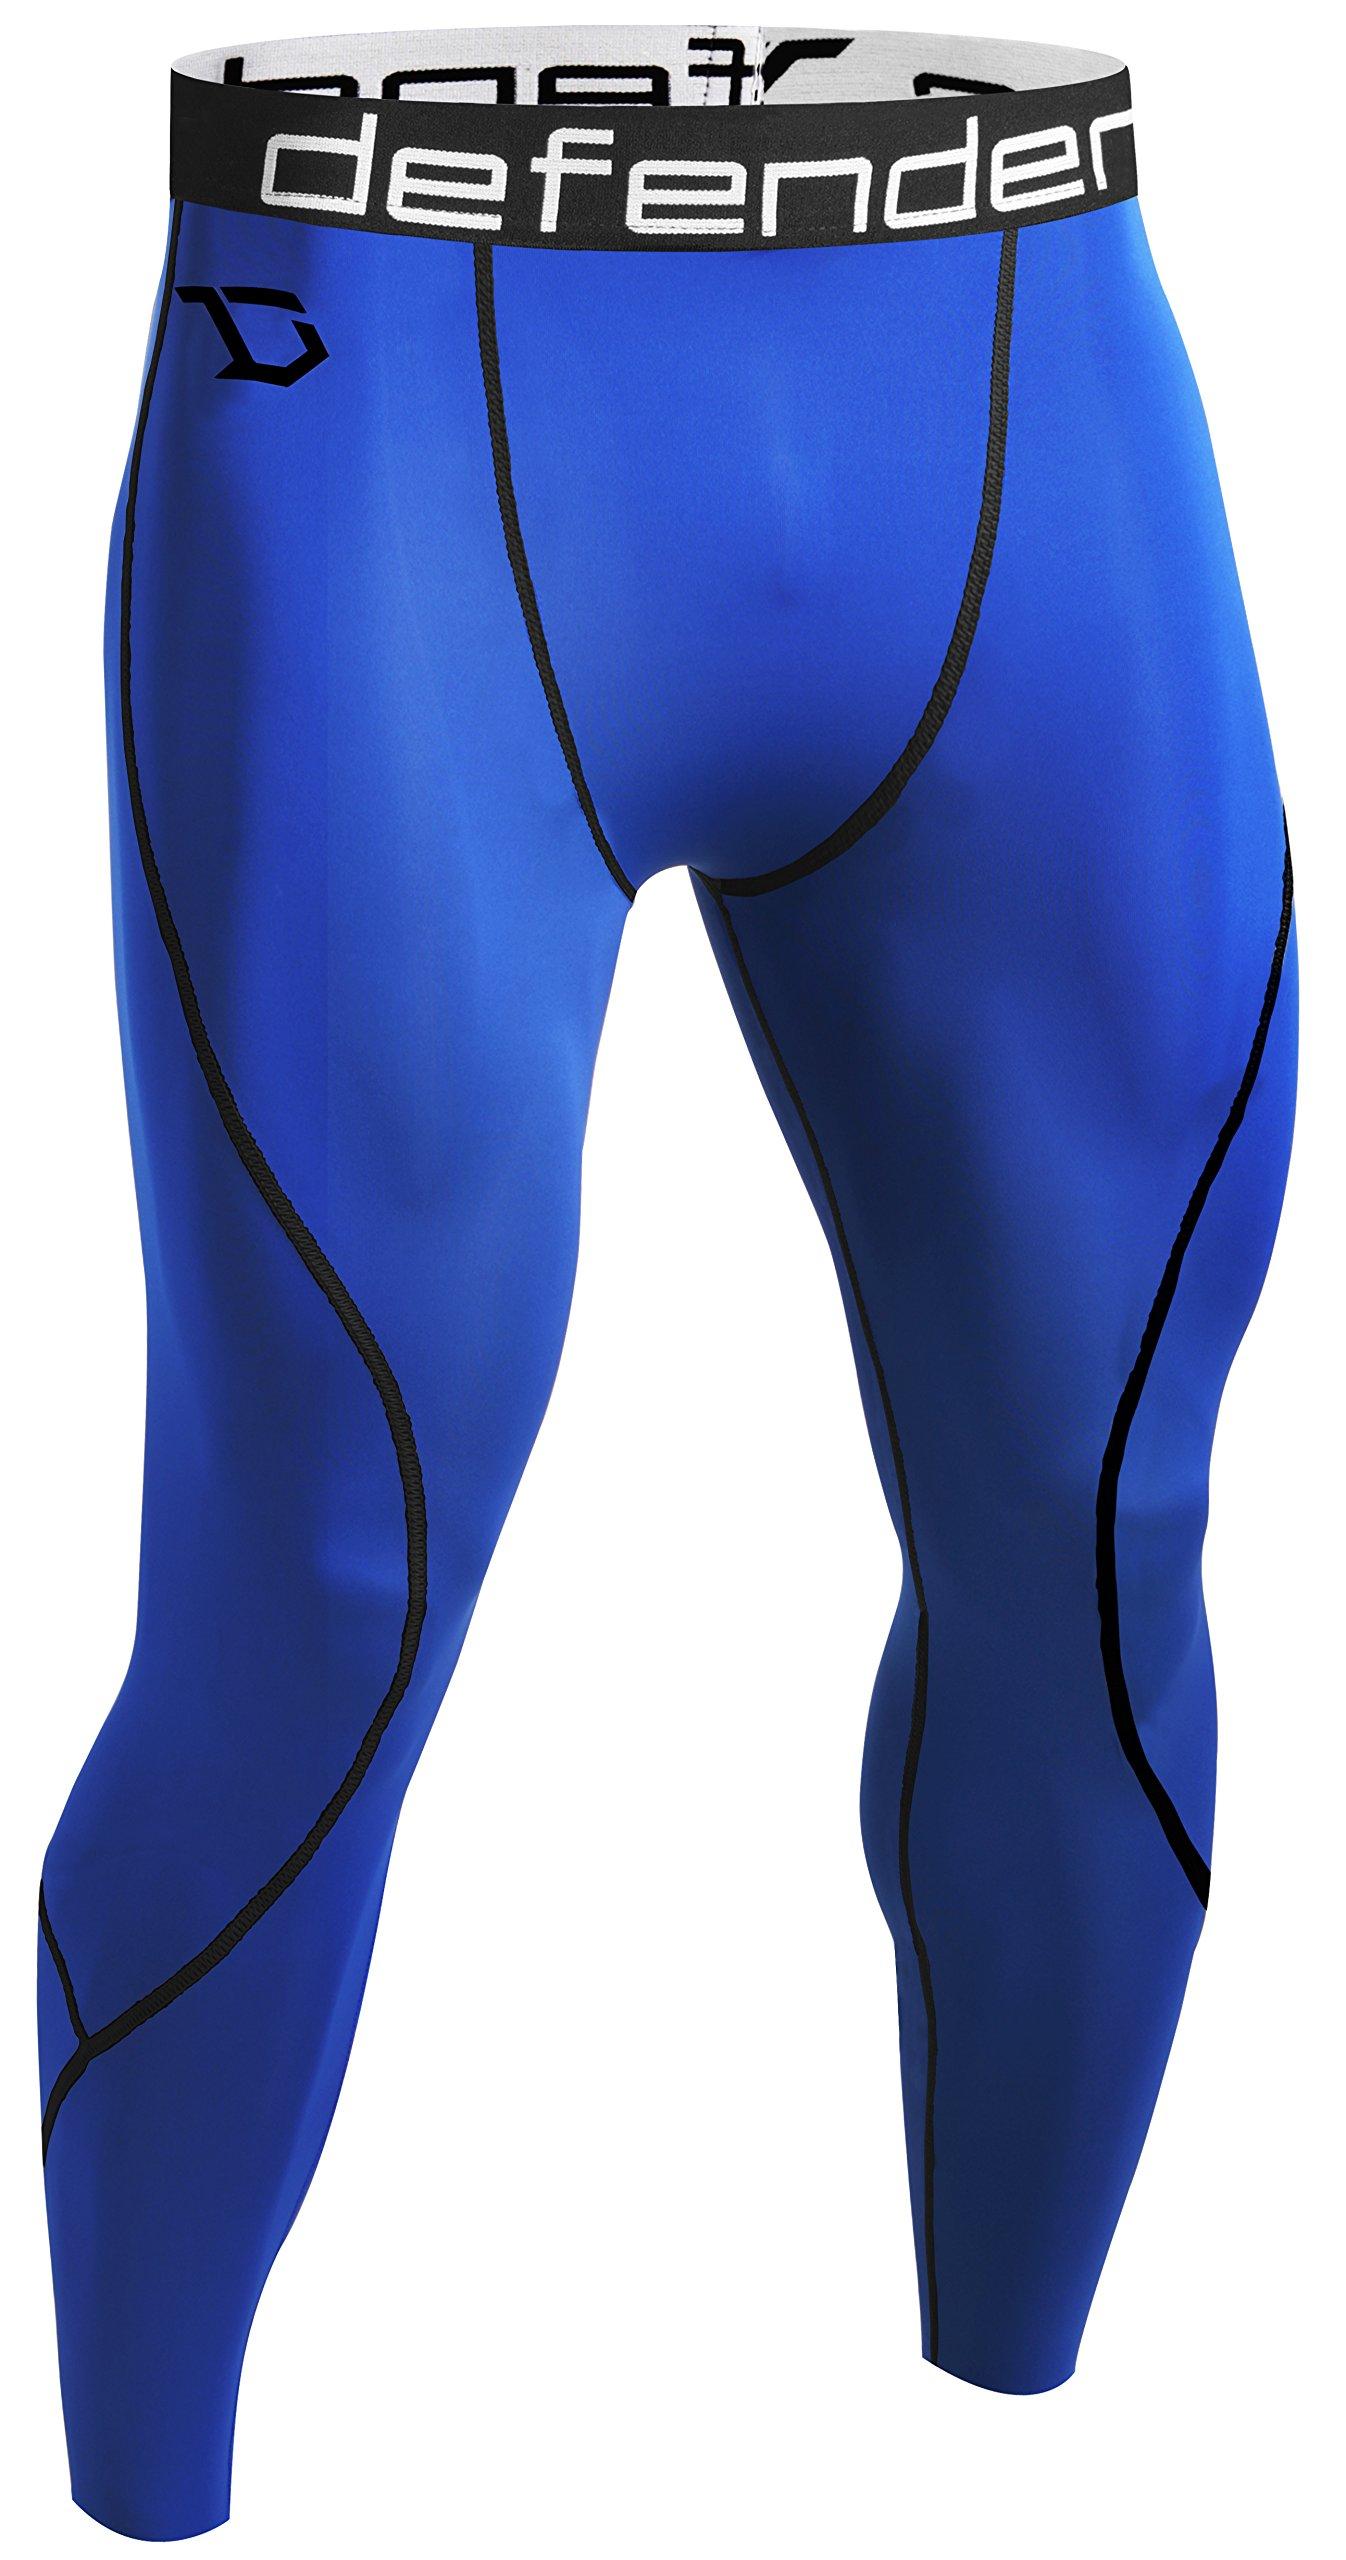 Defender Mens Compression Tights Pants Workout Heat Sports Soccer,781-blueblack,XX-Large by Defender